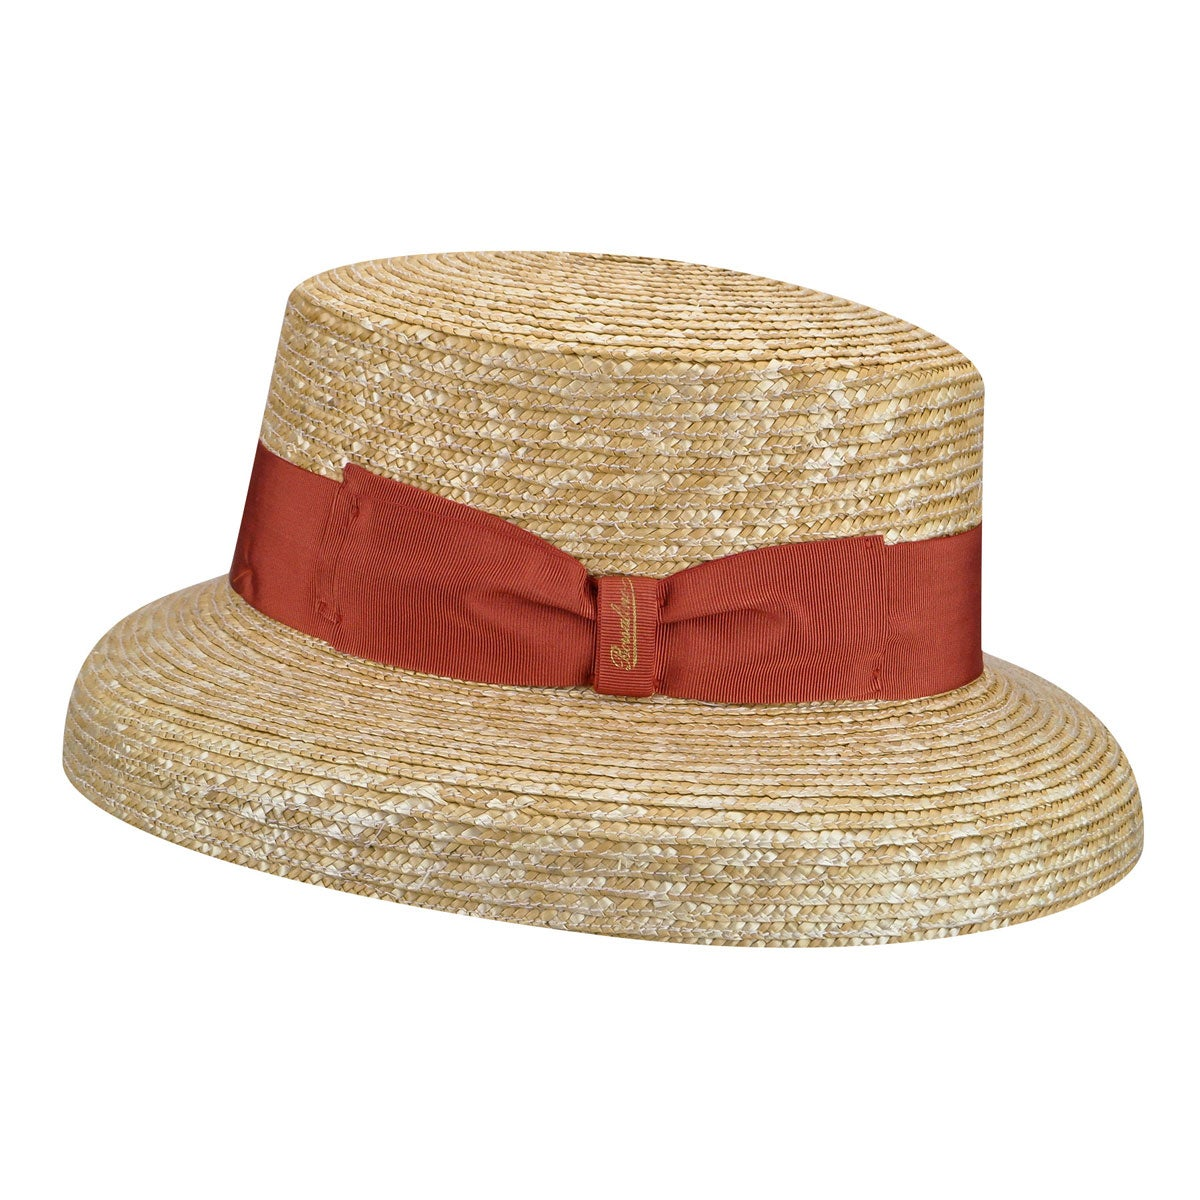 1940s Style Hats 232105 Audrey Treccia Paglia Boater $263.00 AT vintagedancer.com